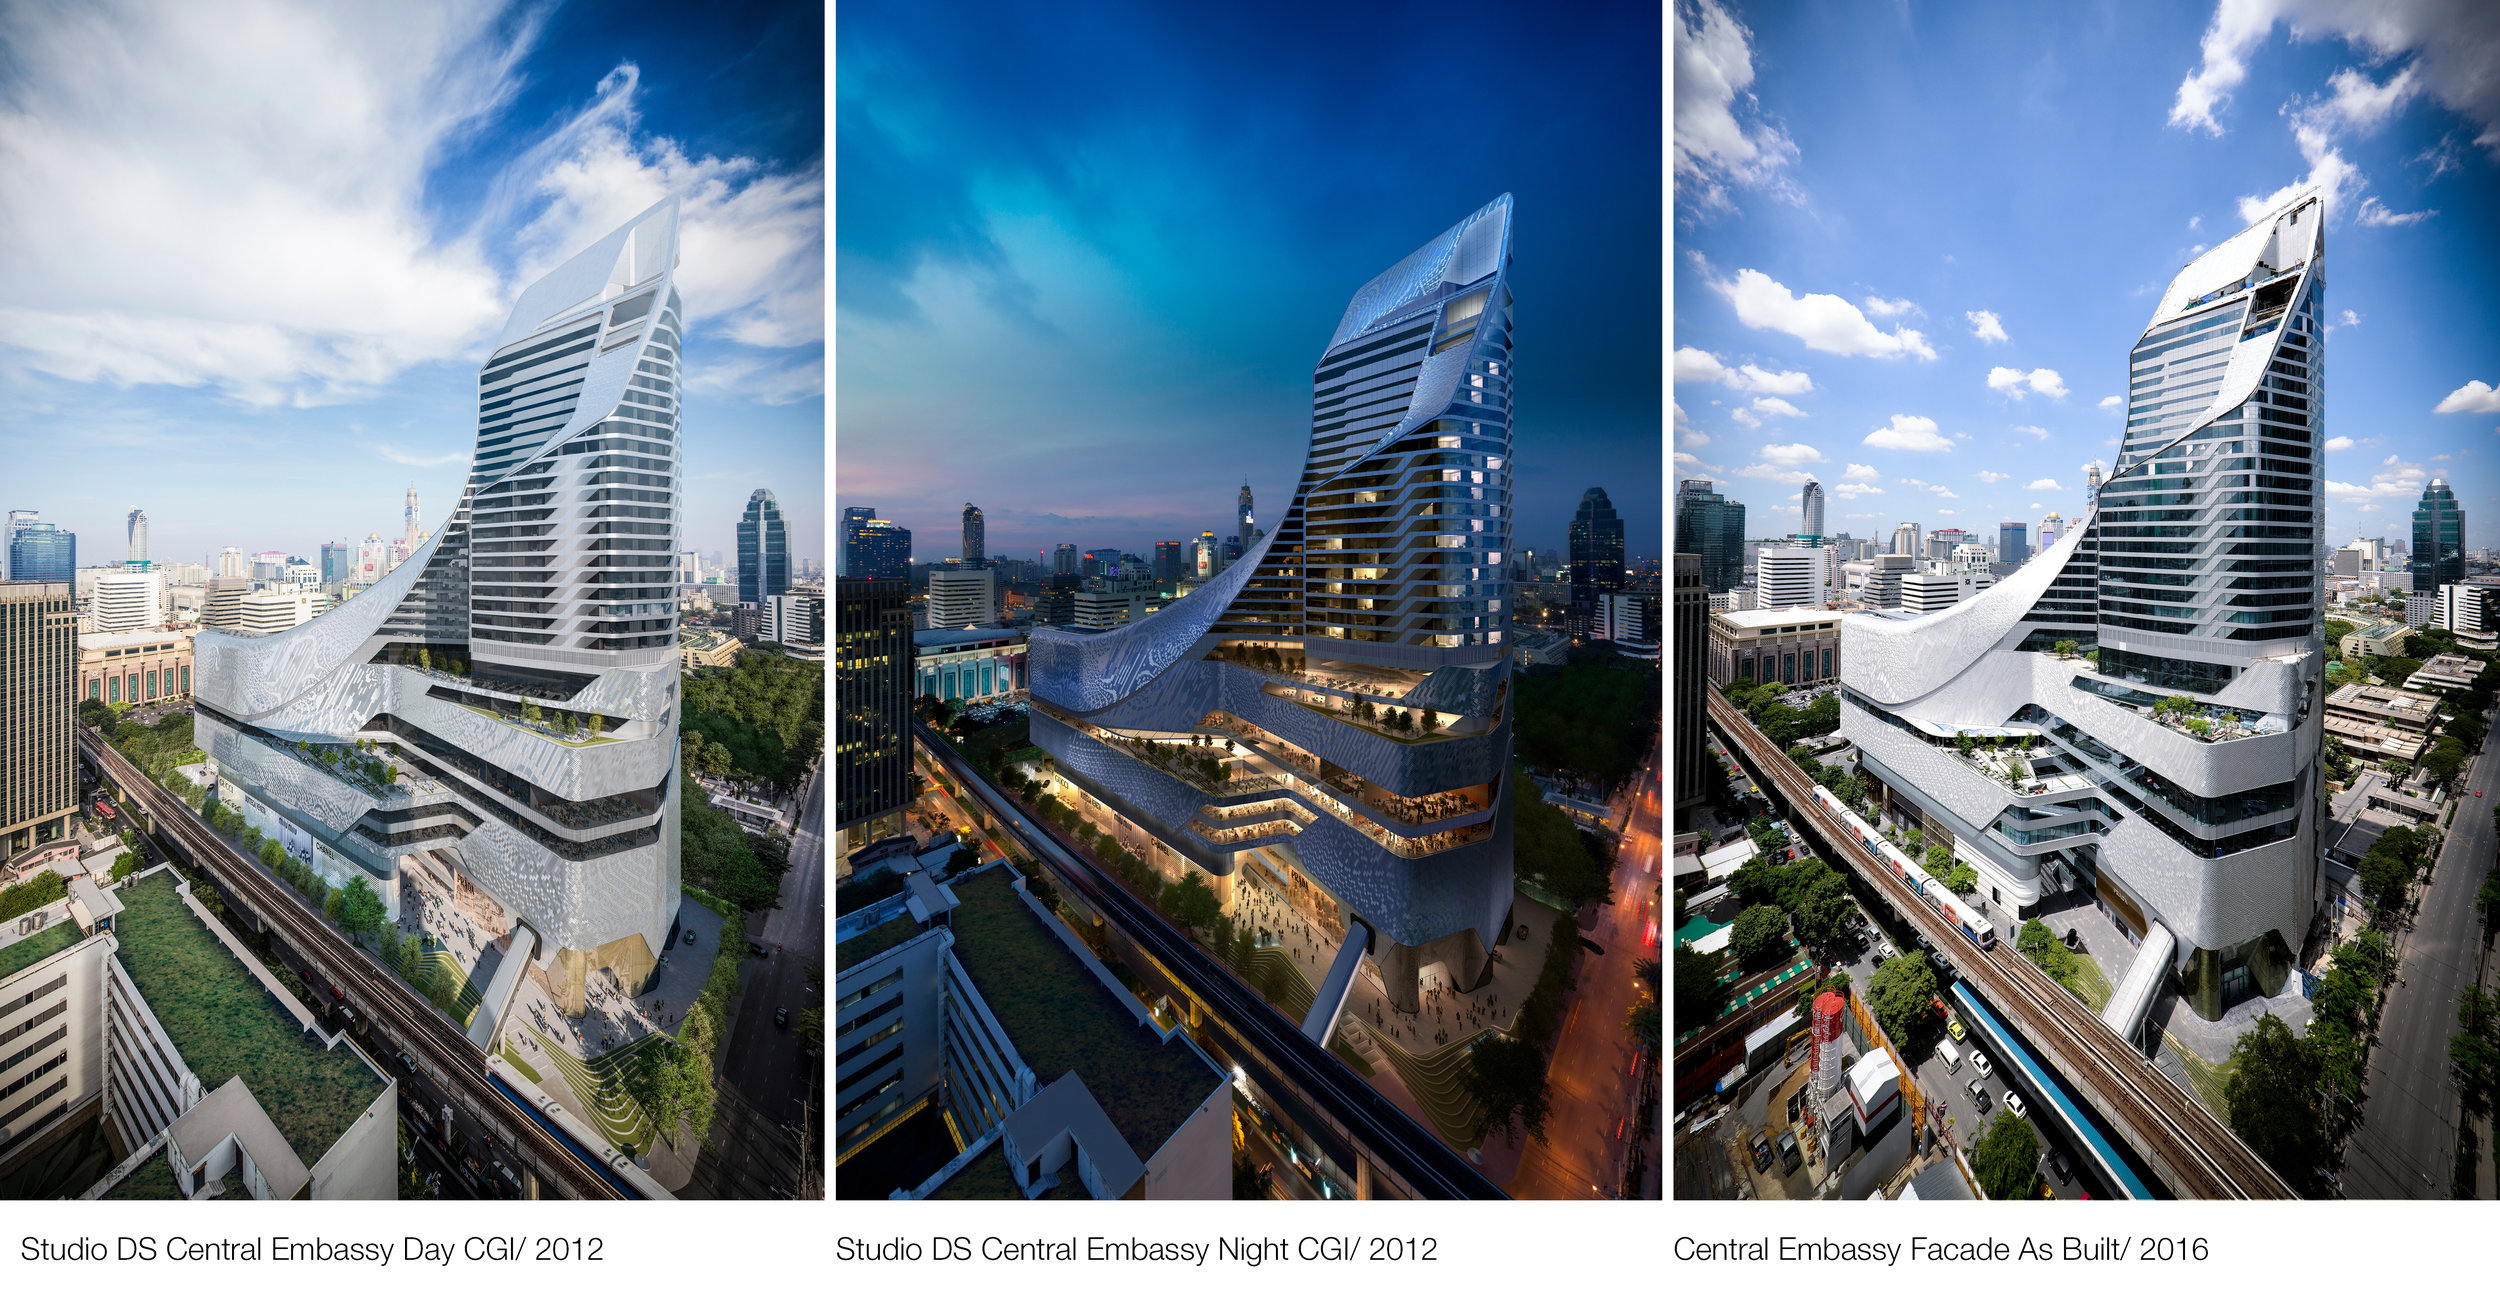 © Copyright Studio DS 2018 - Central Embassy Architecture Comparison